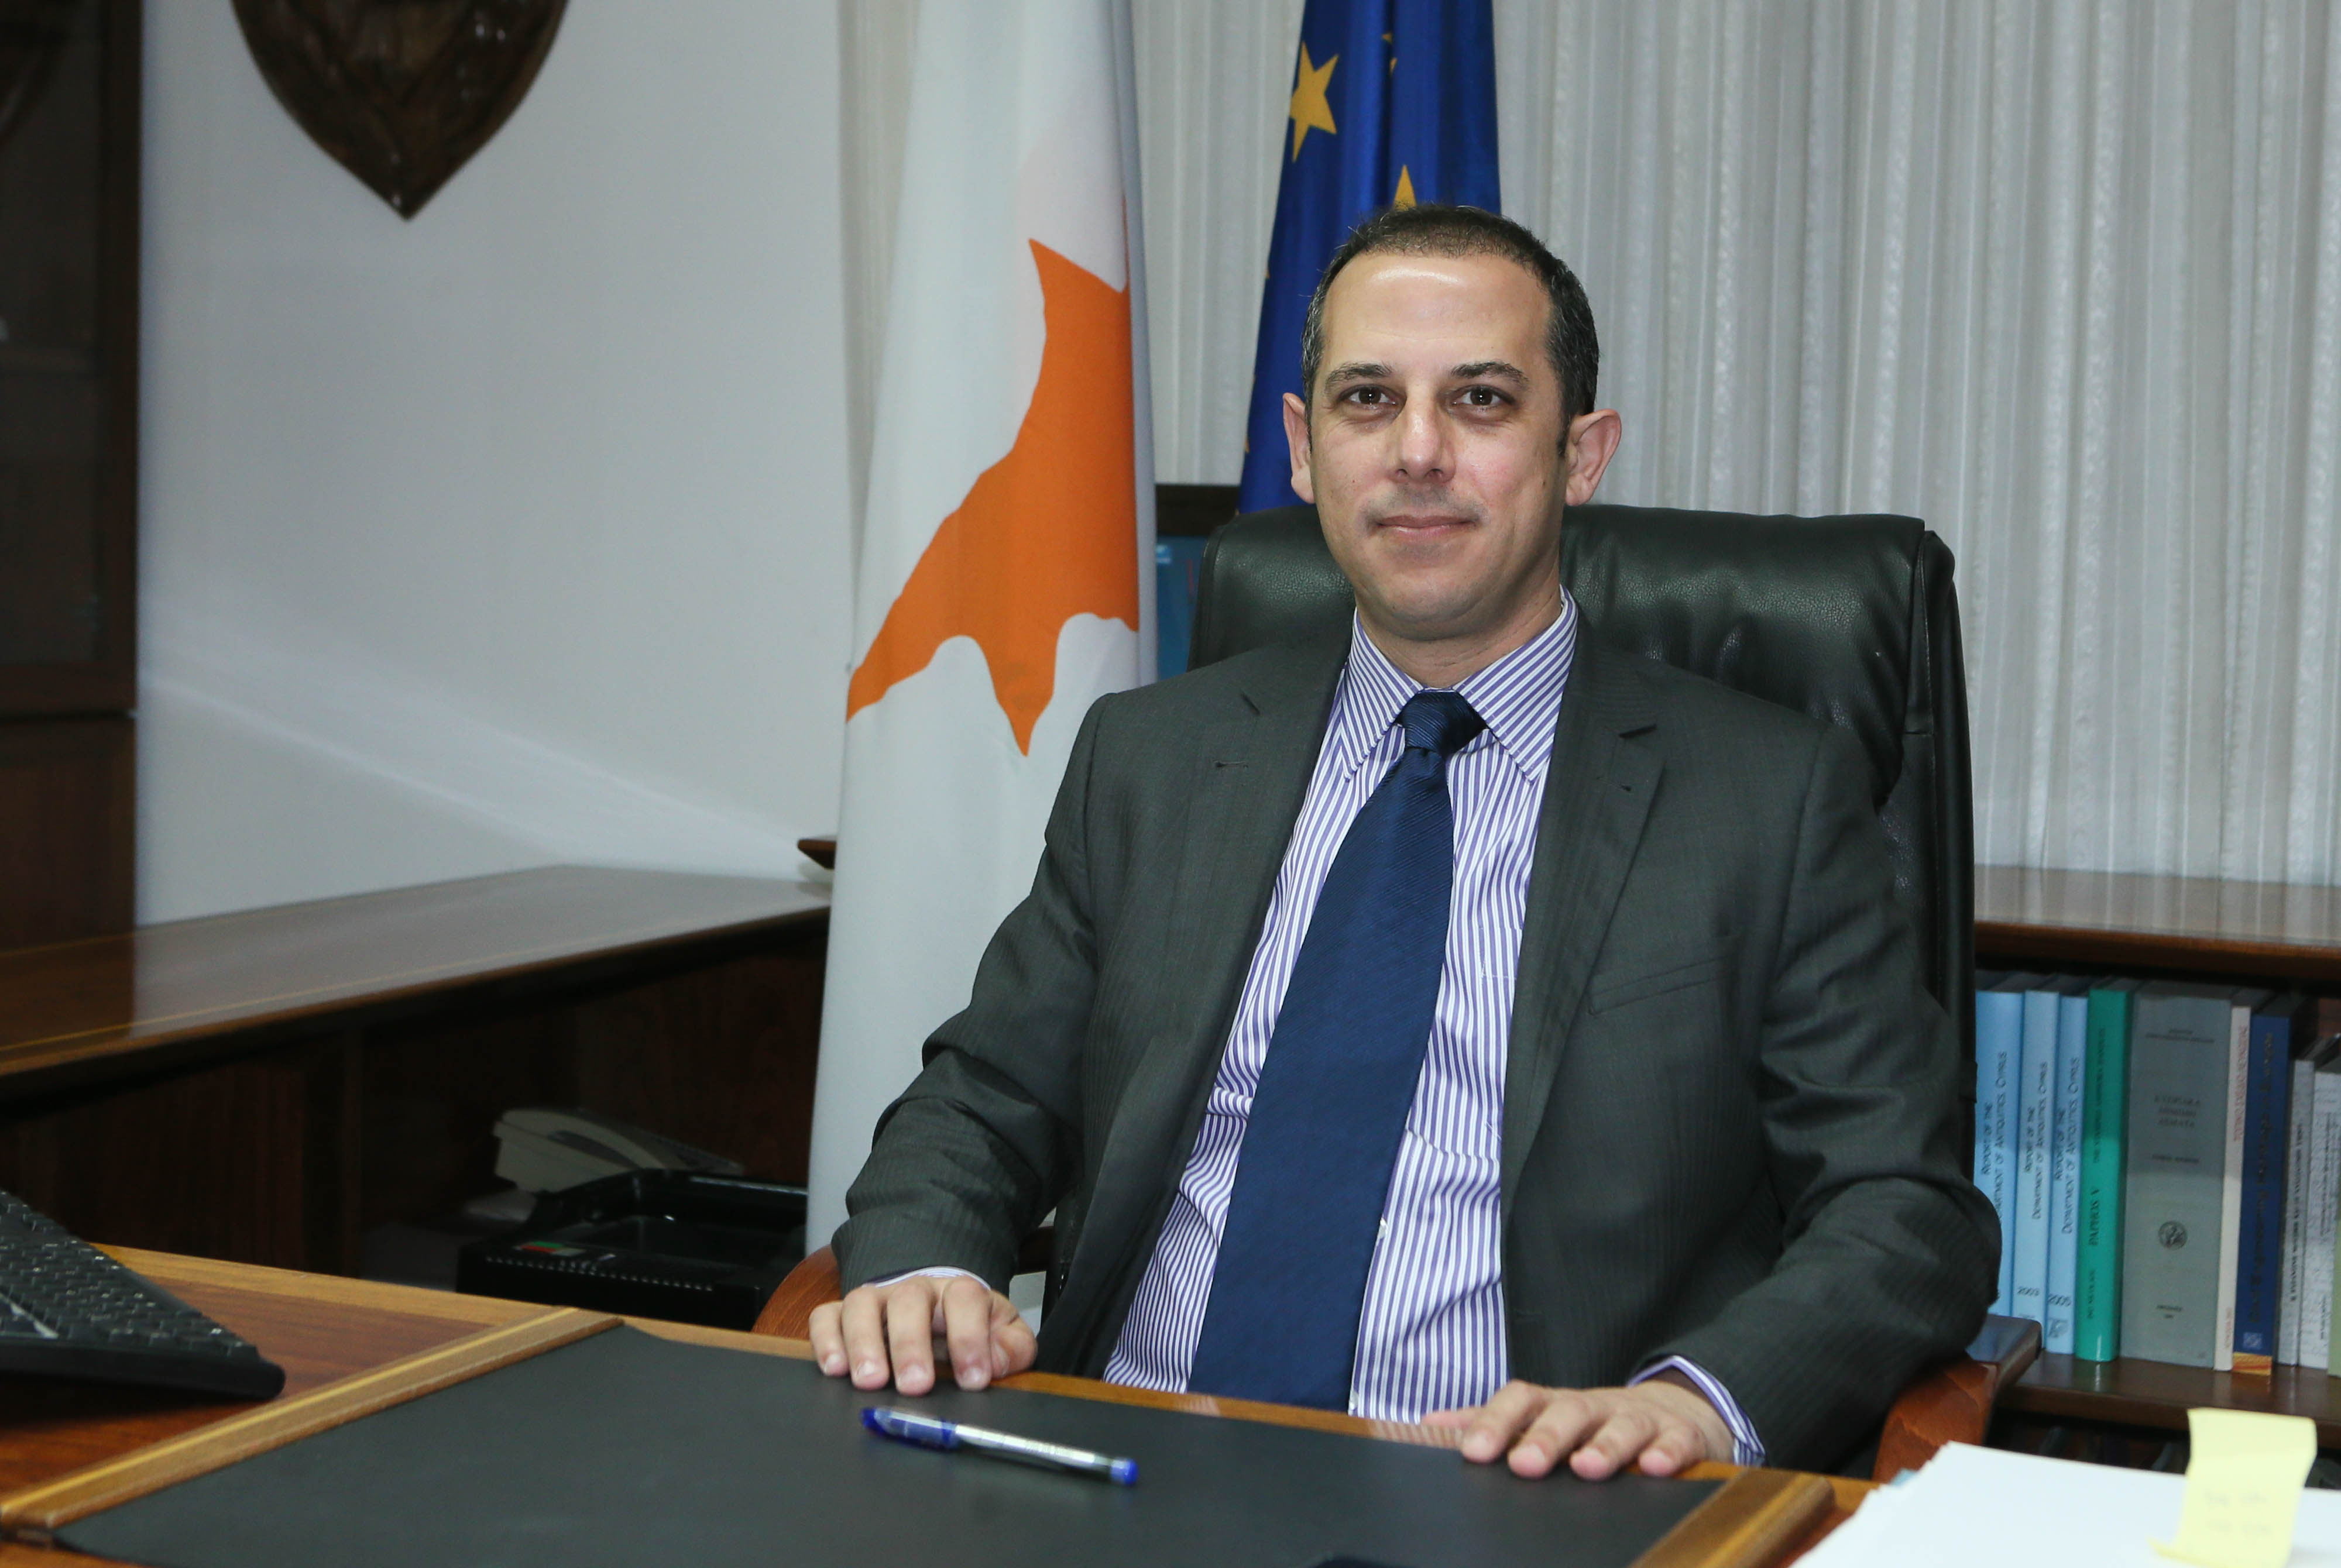 Marios Demetriades